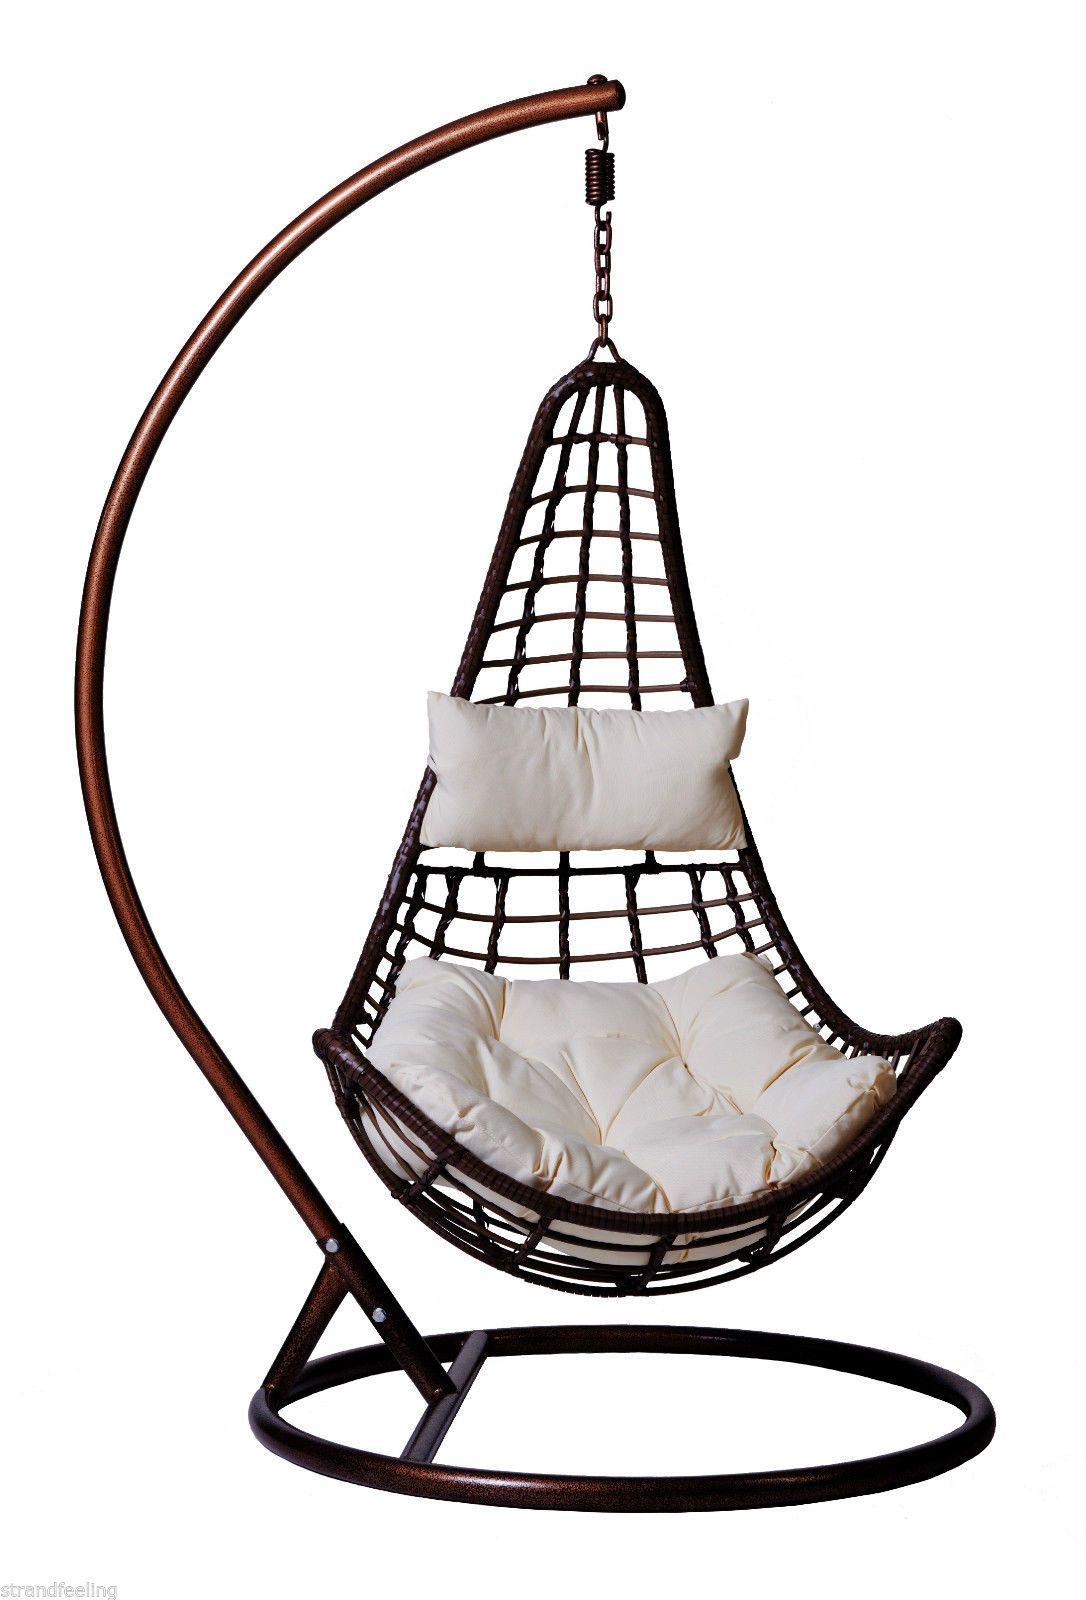 Swing Chair Benefits Lounge Beach Chairs Hängesessel Diva Hängekorb Kokon Schaukel Aus Polyrattan